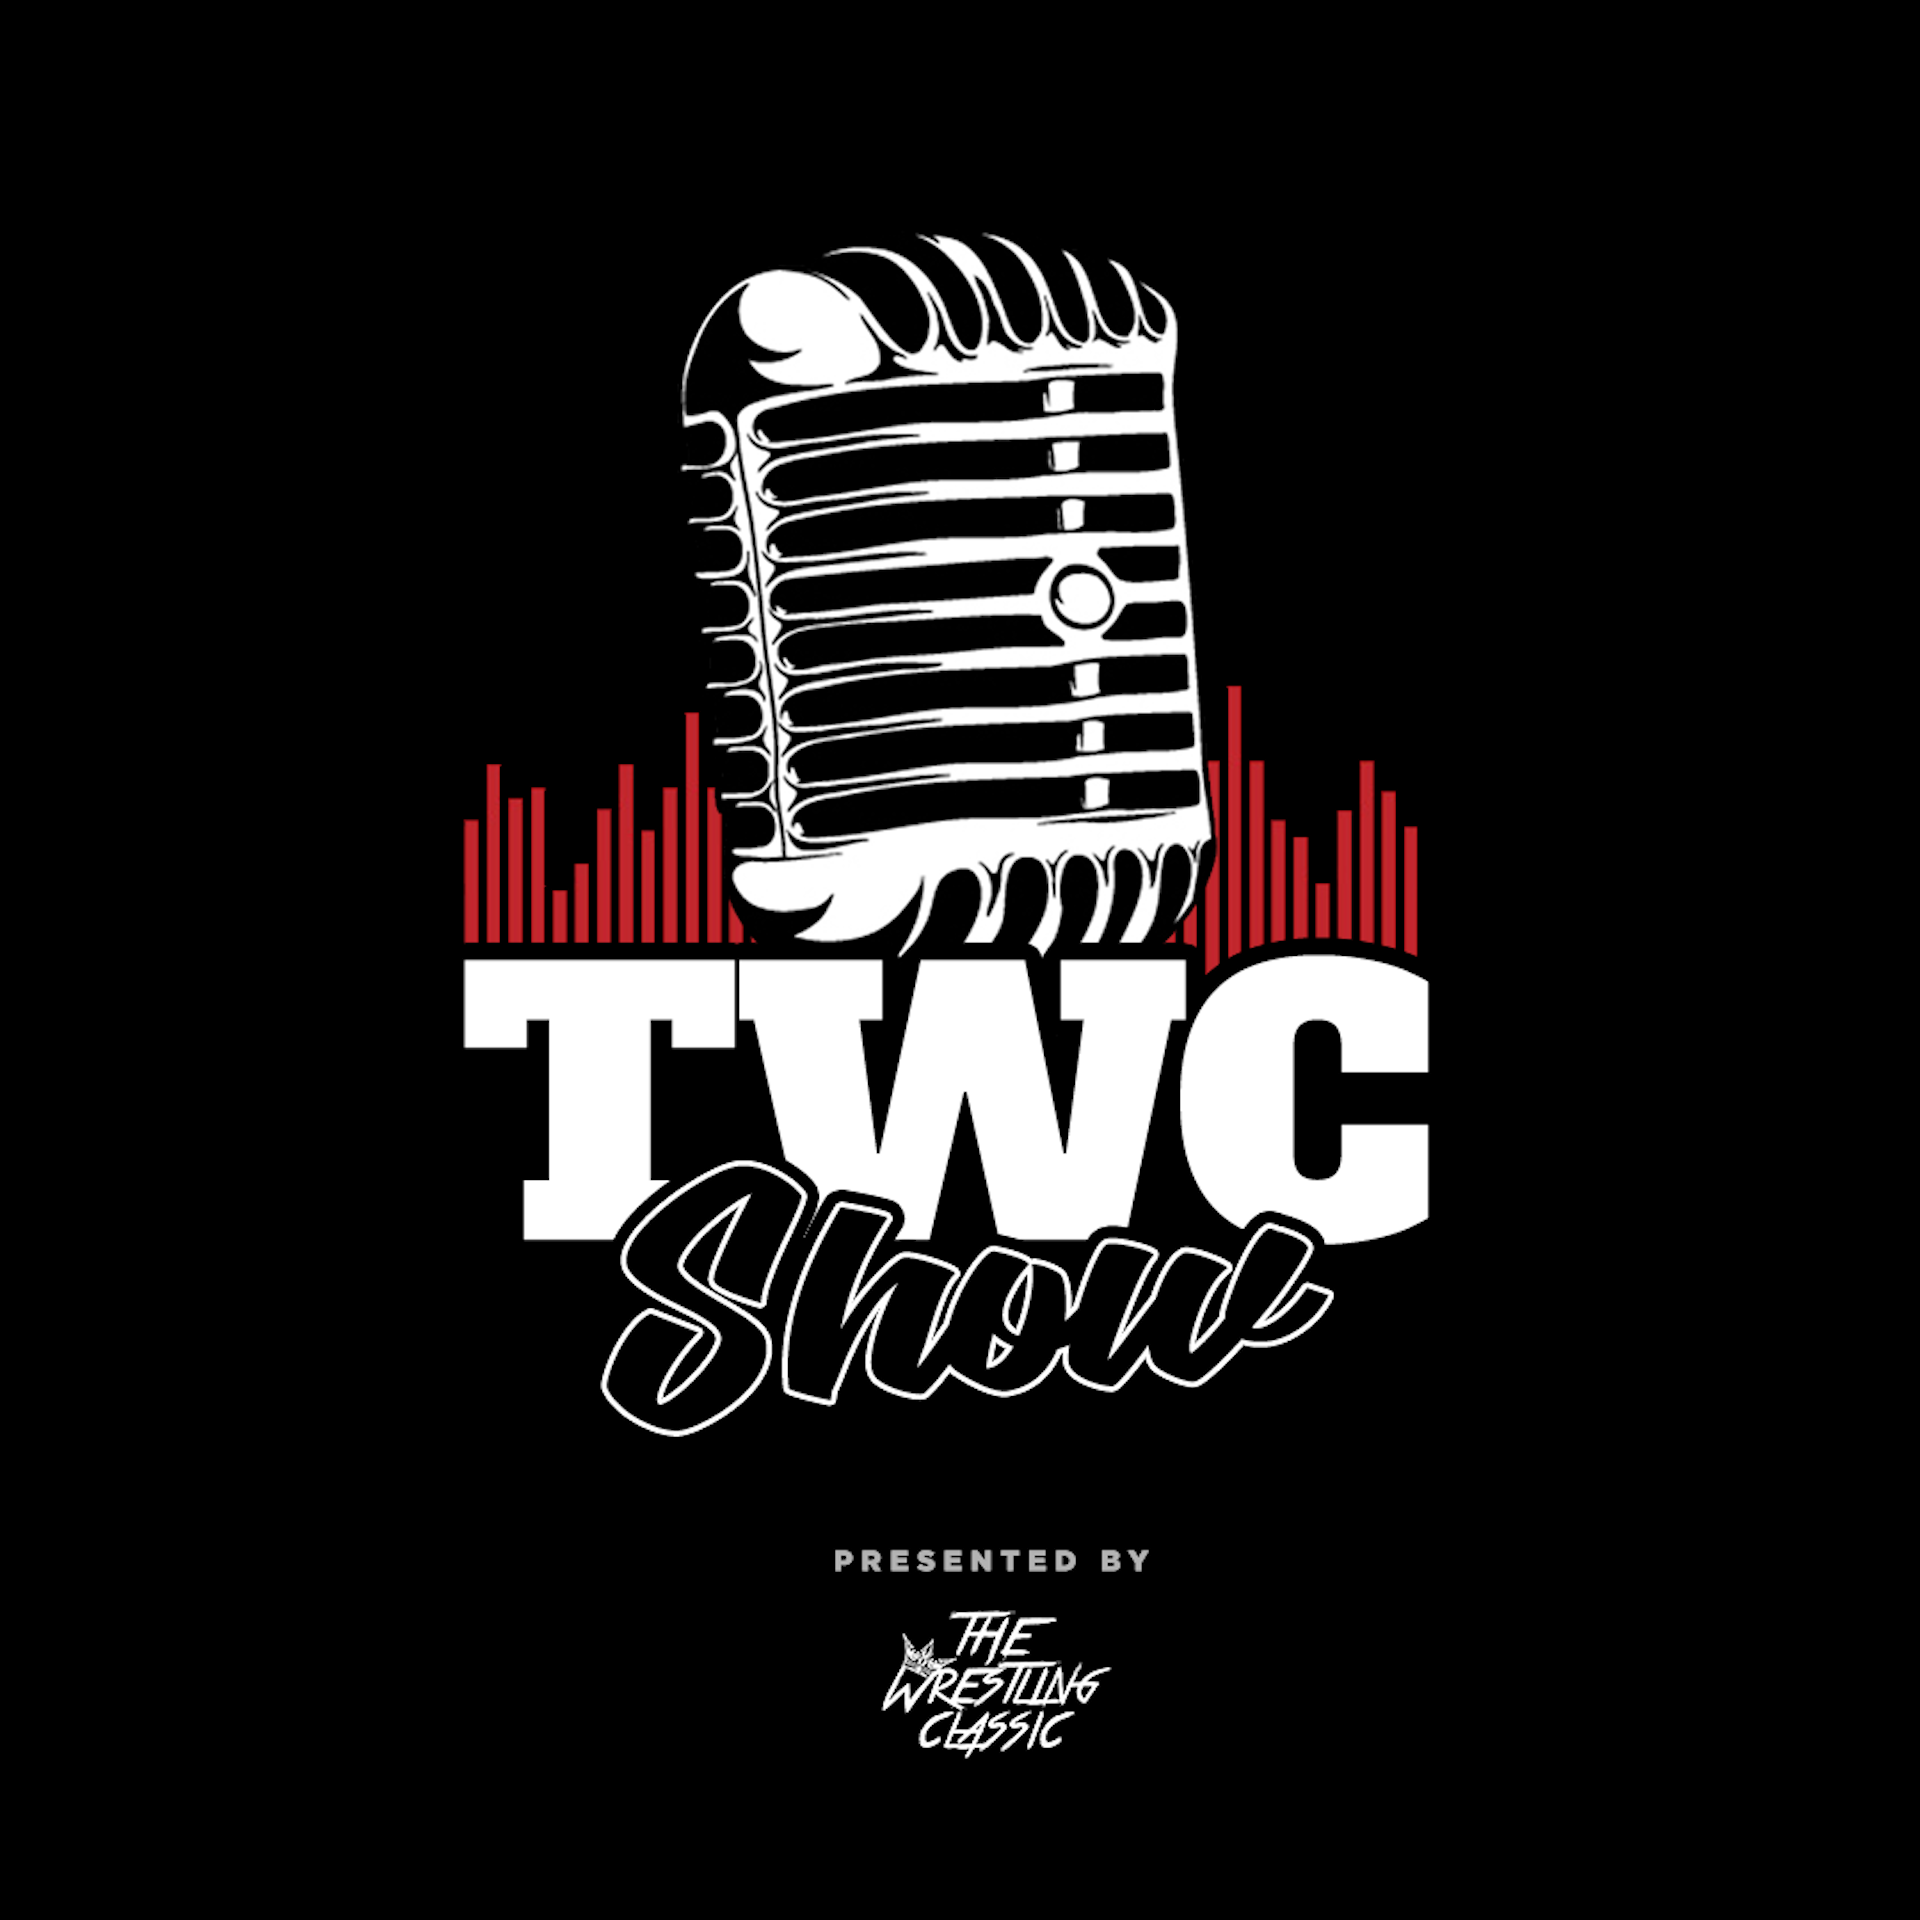 TWC Show Episode 11 – A Dynamite Week of Wrestling! AEW vs. NXT and Raw's Season Premiere